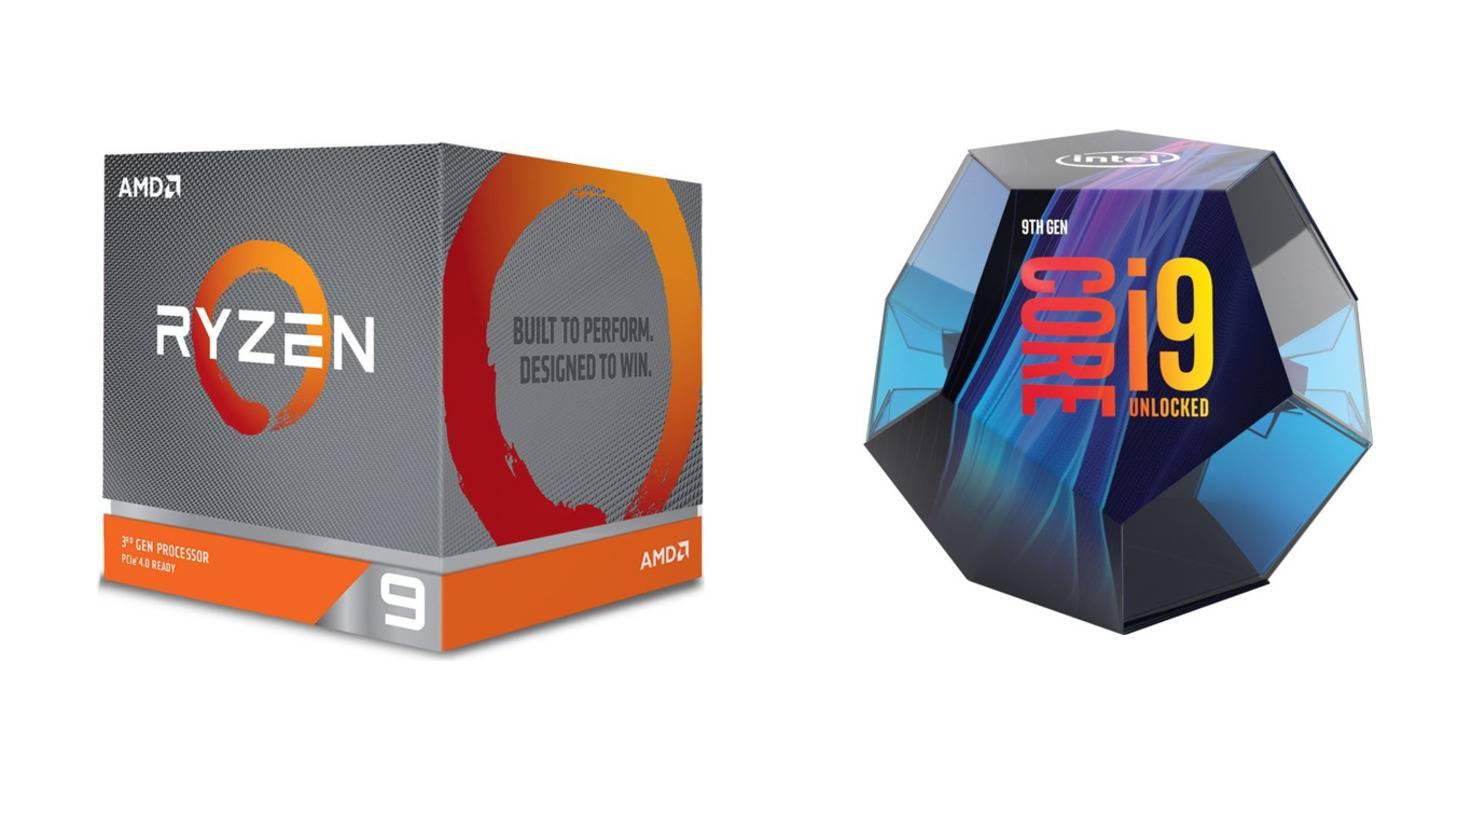 amd-ryzen-3900x-intel-core-i9-9900k-prozessor-chip